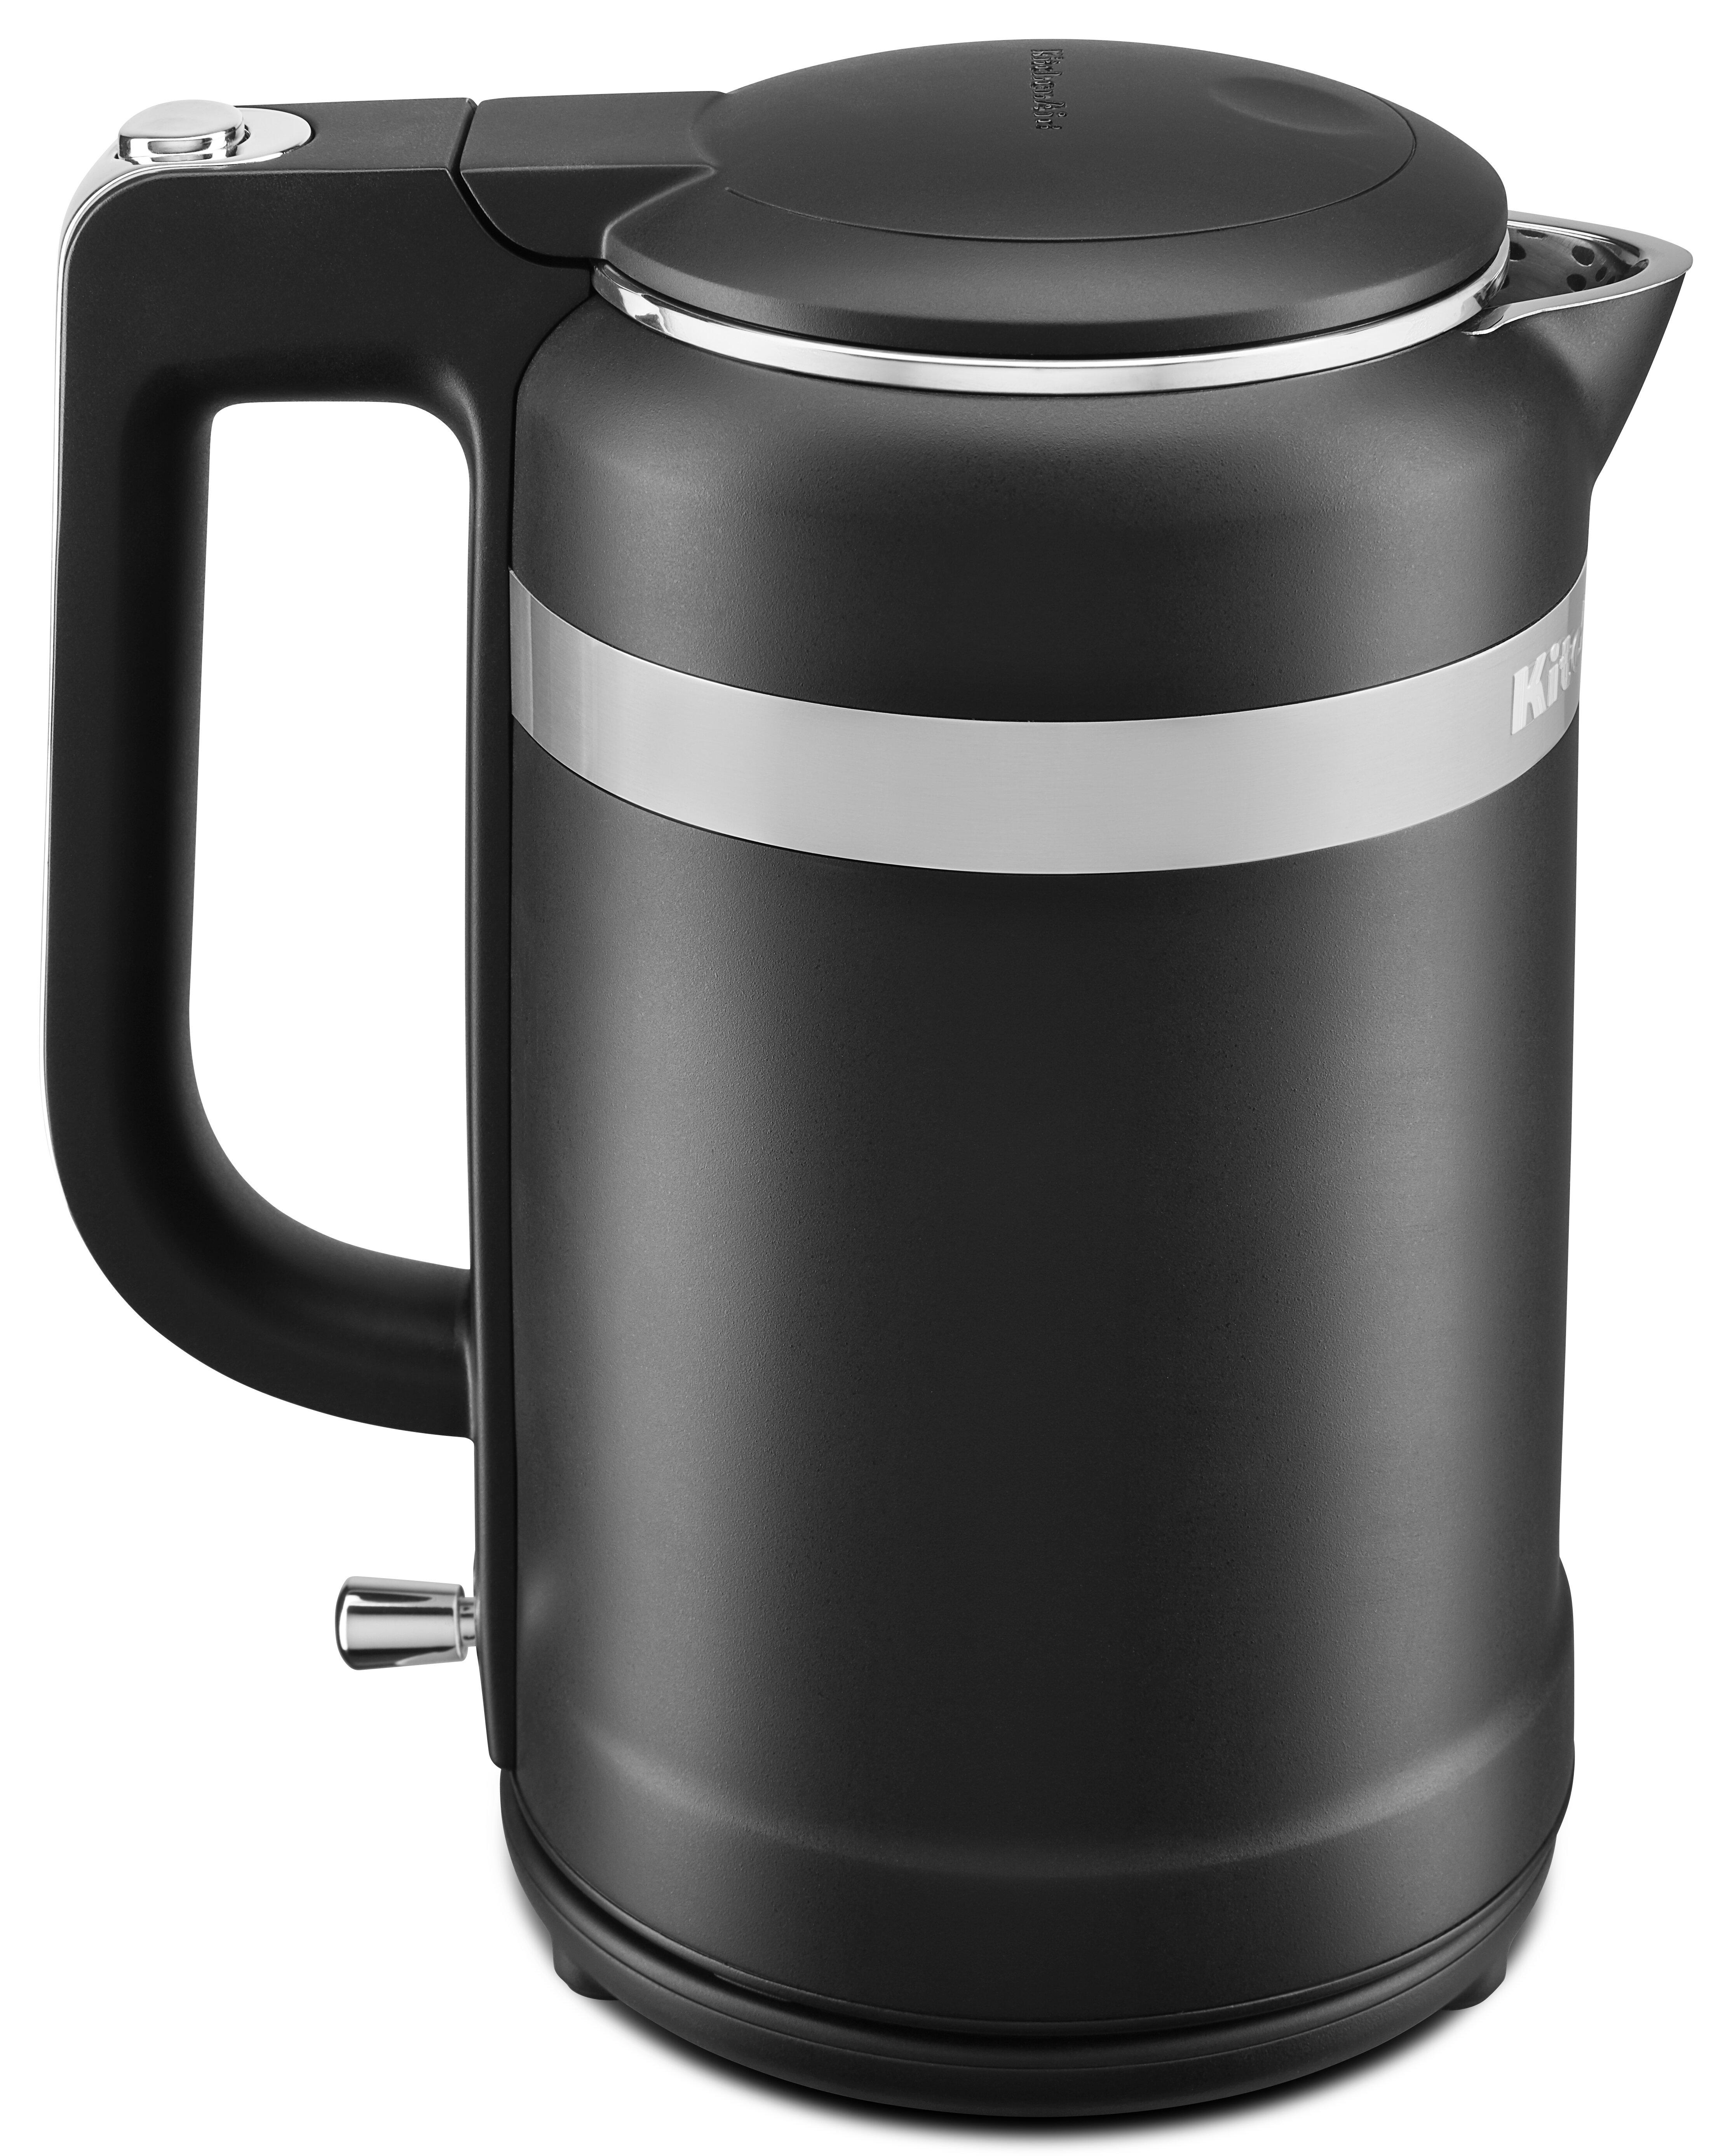 KitchenAid 1.58 Qt. Stainless Steel Electric Tea Kettle - KEK1565